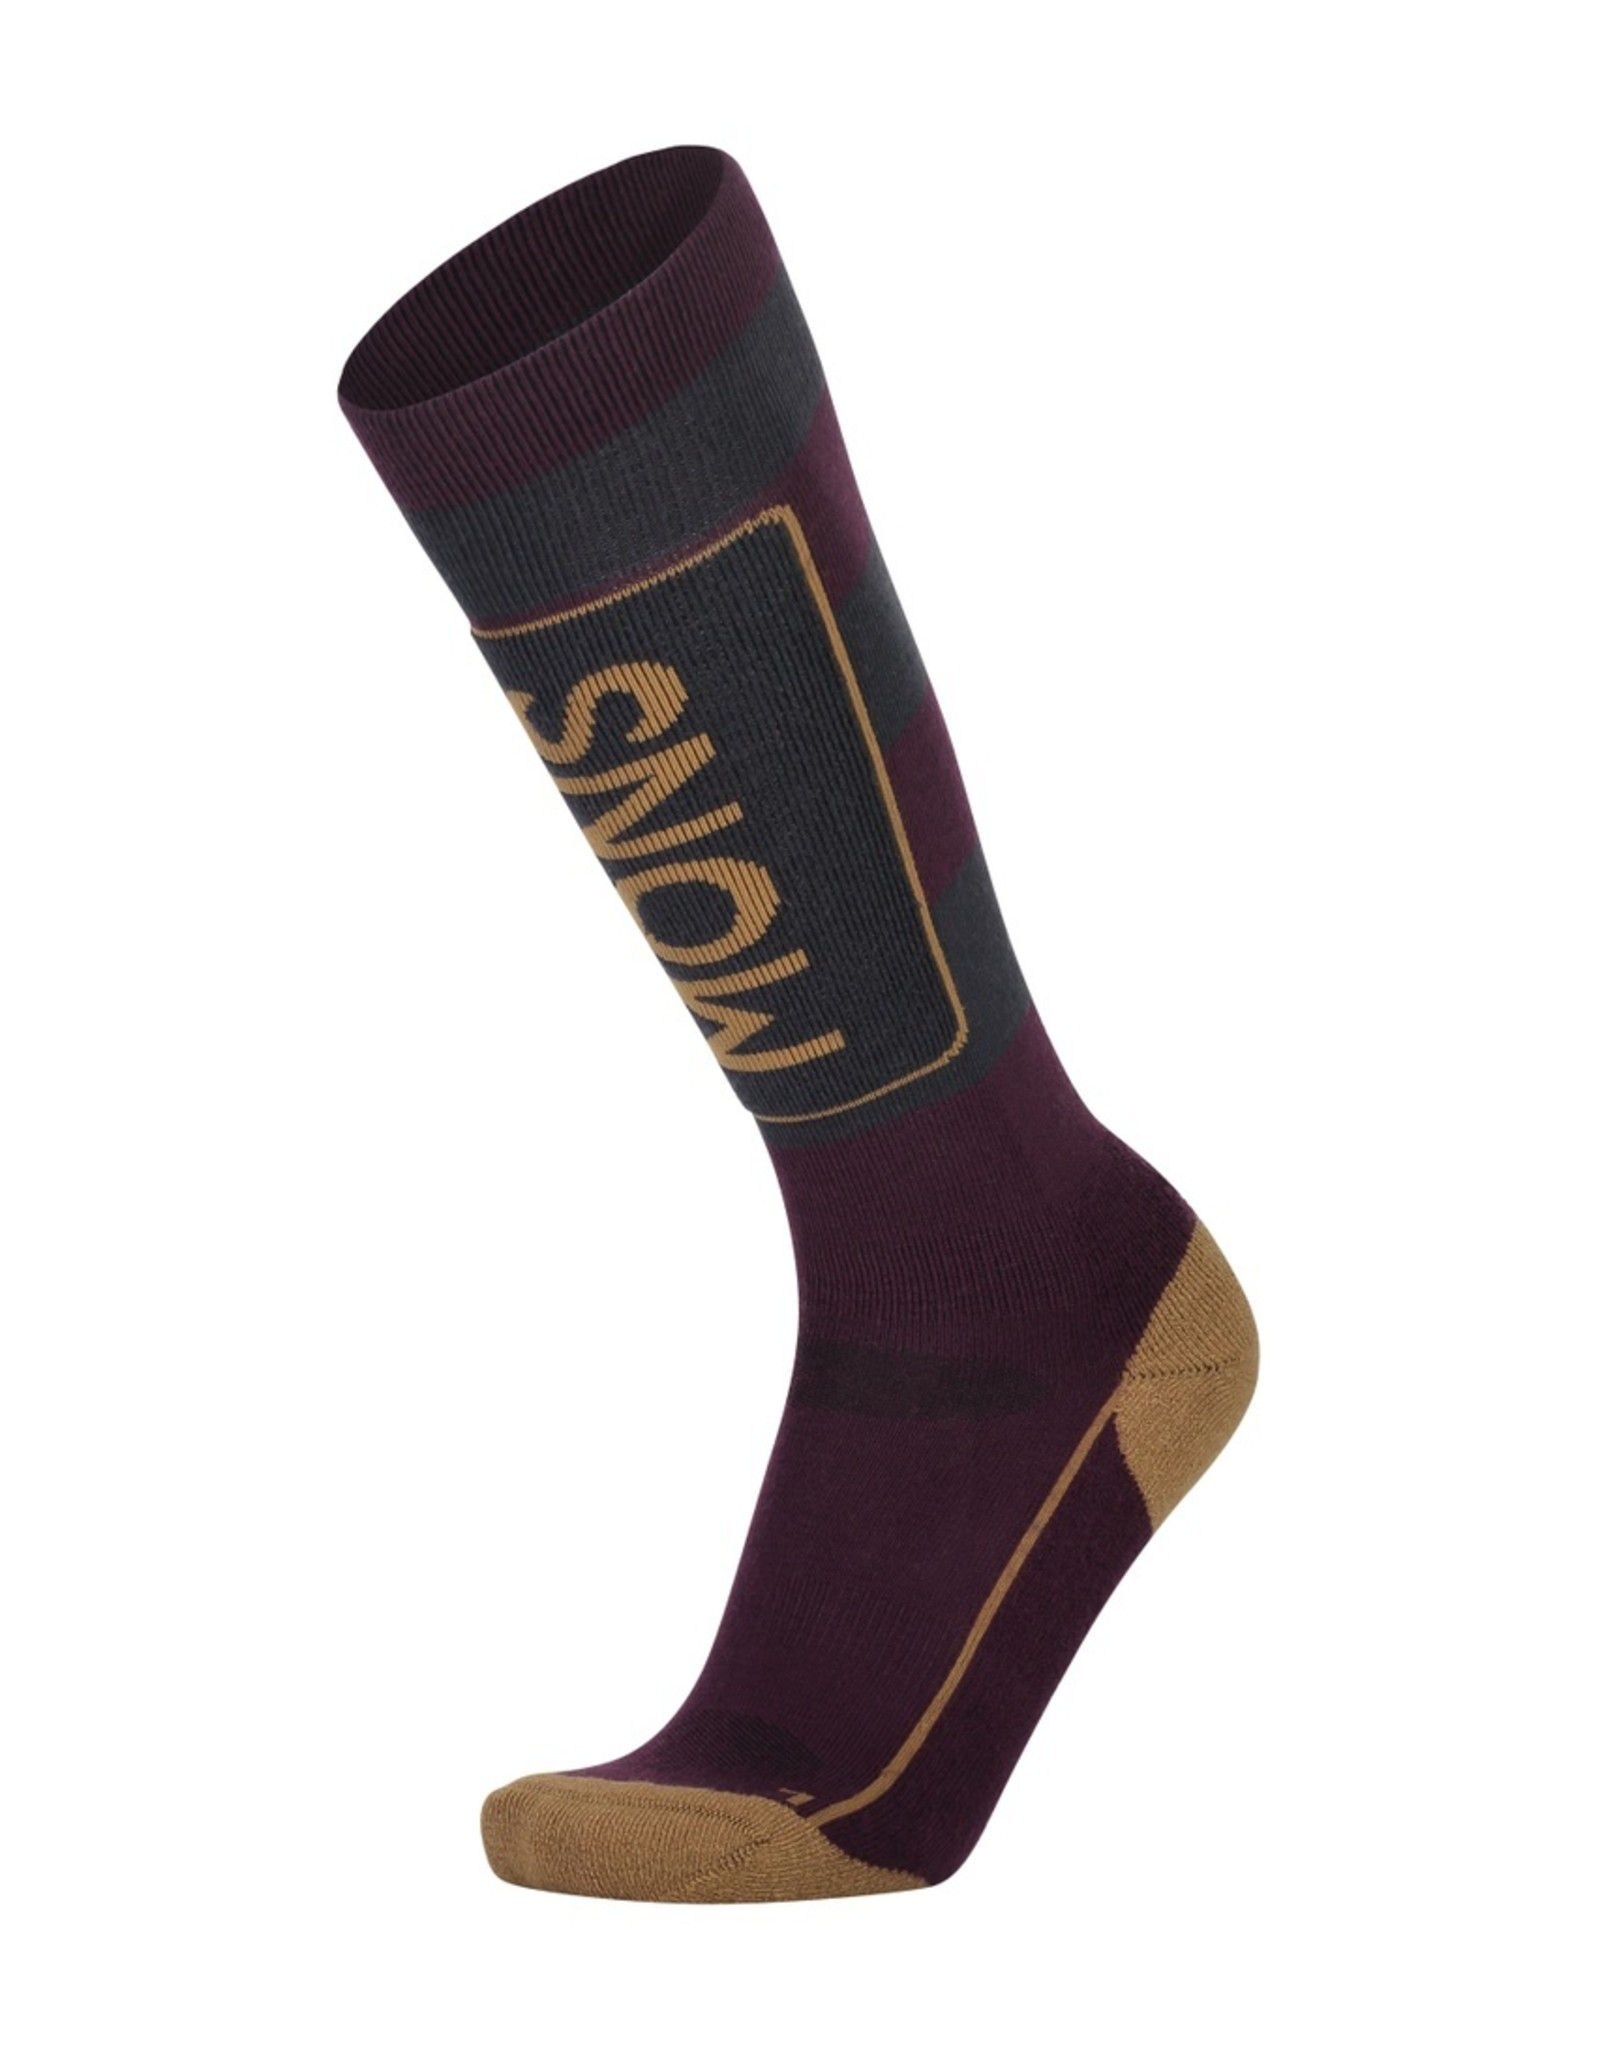 Mons Royale Mons Royale Mens Mons Tech Cushion Sock -W2022